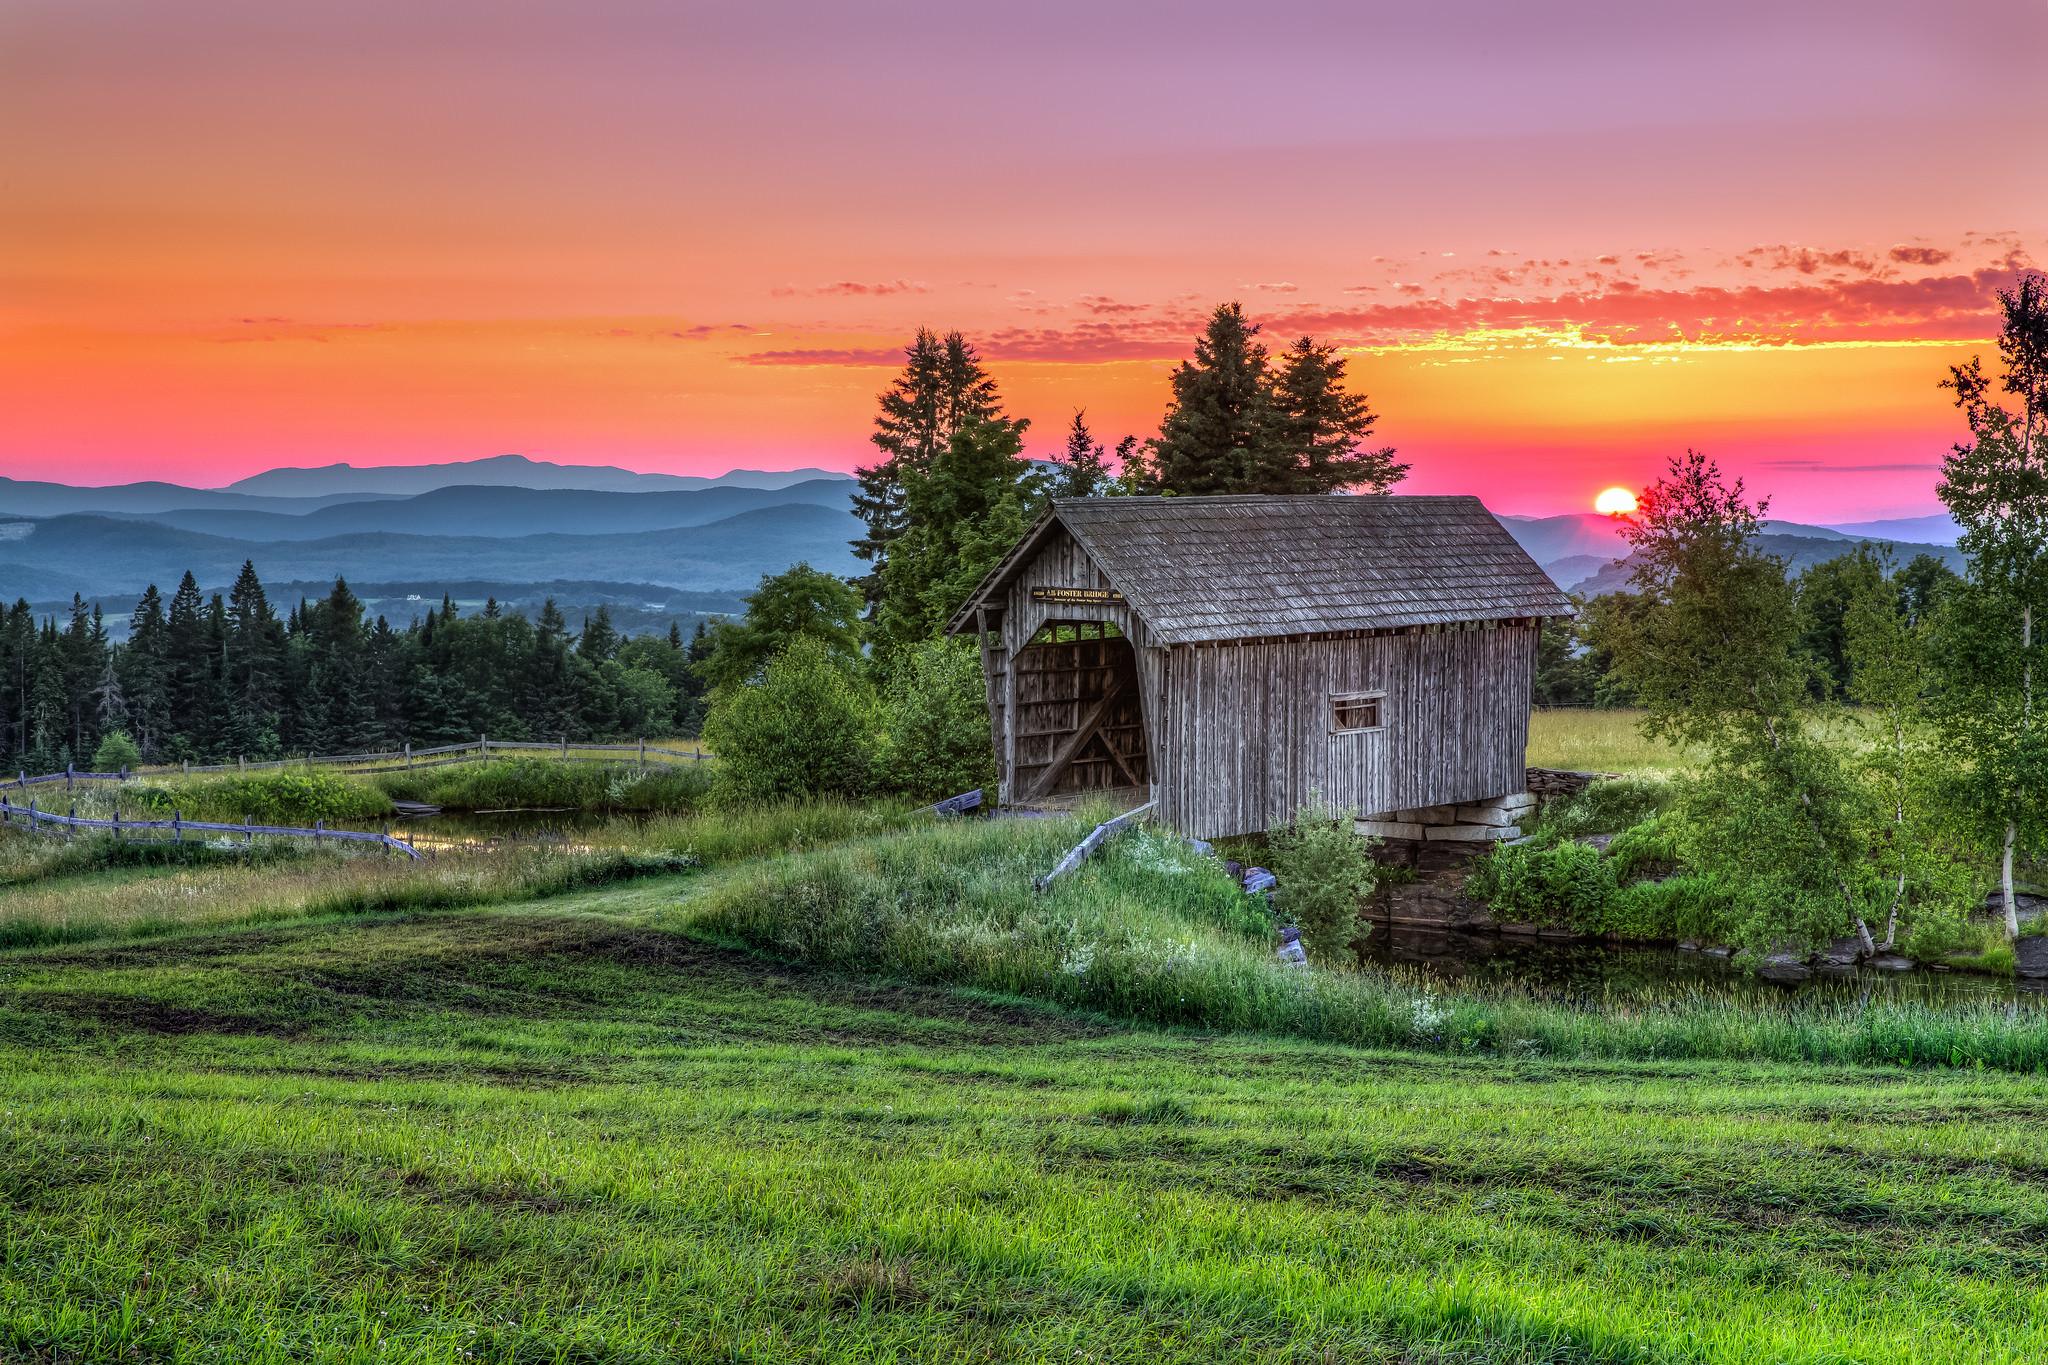 обои Новая Англия, Ортон мост, крытый мост, Вермонт картинки фото